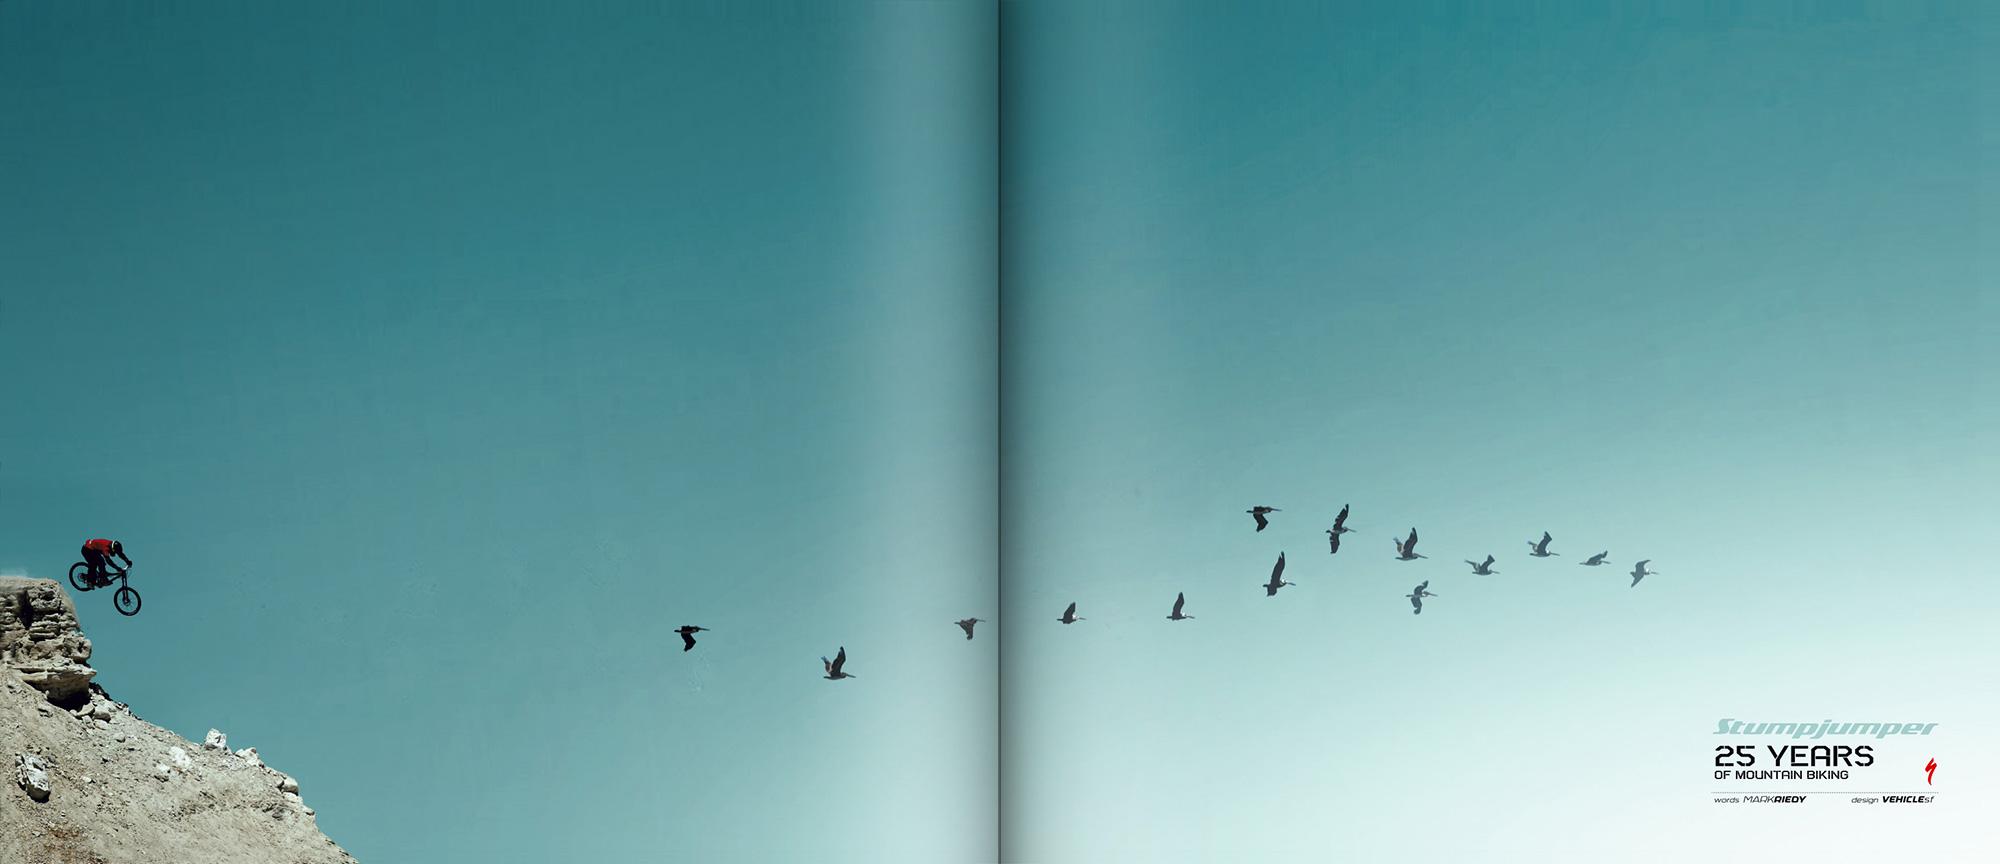 Stunt jumper anniversary book spread images of birds